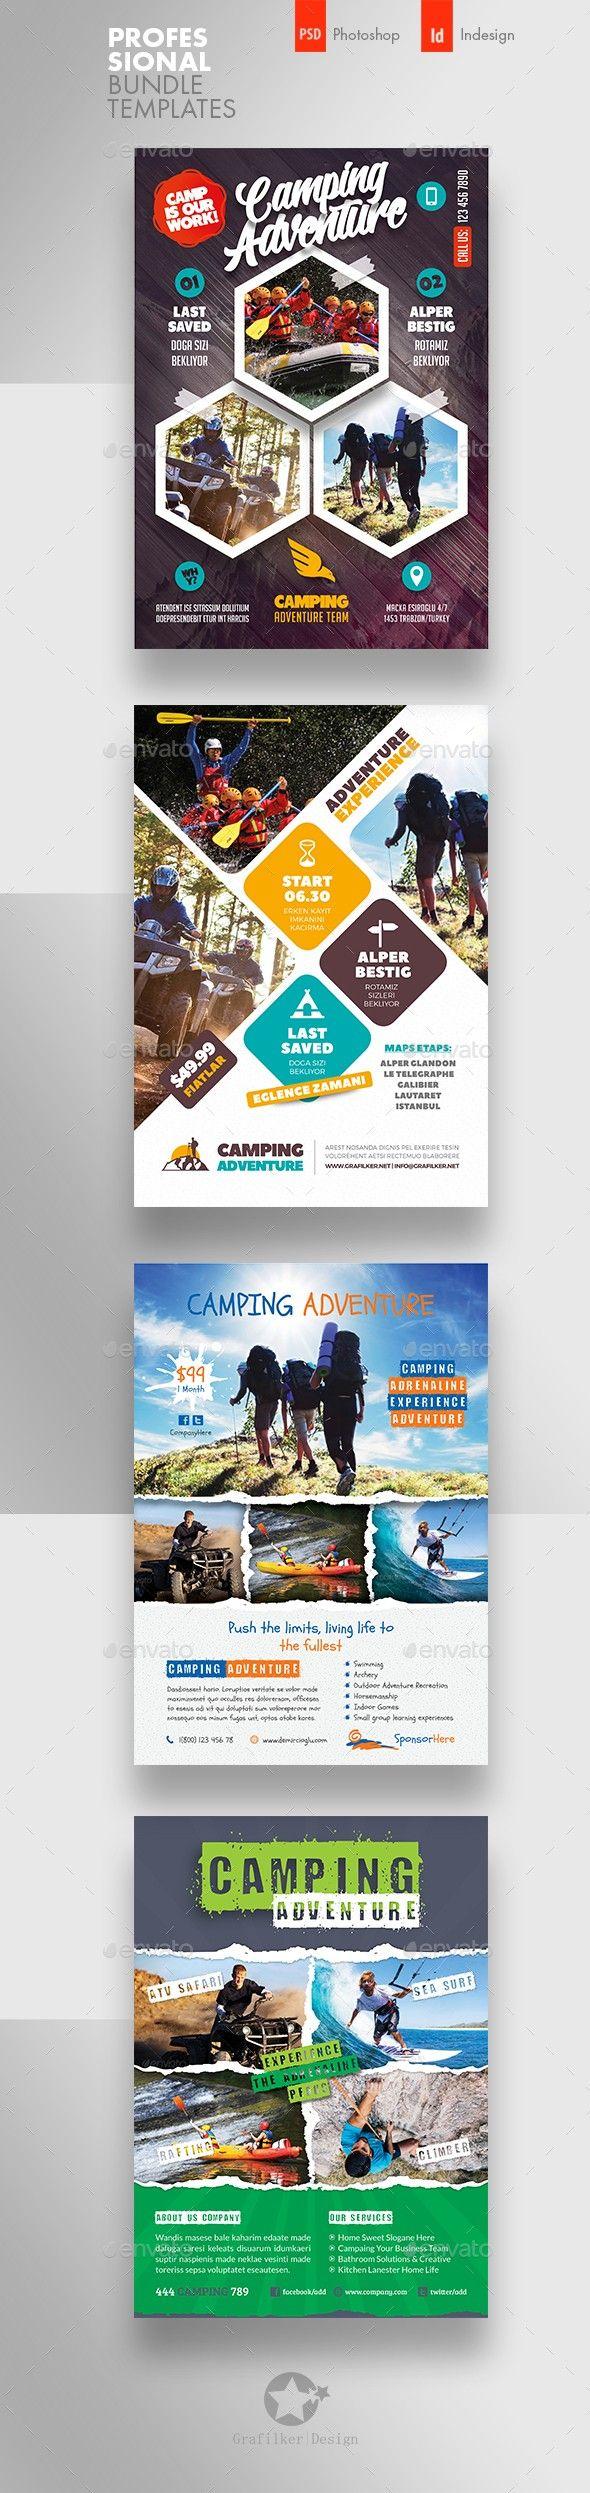 Camping Adventure Flyer Bundle Templates Flyer Templates Flyer Layout